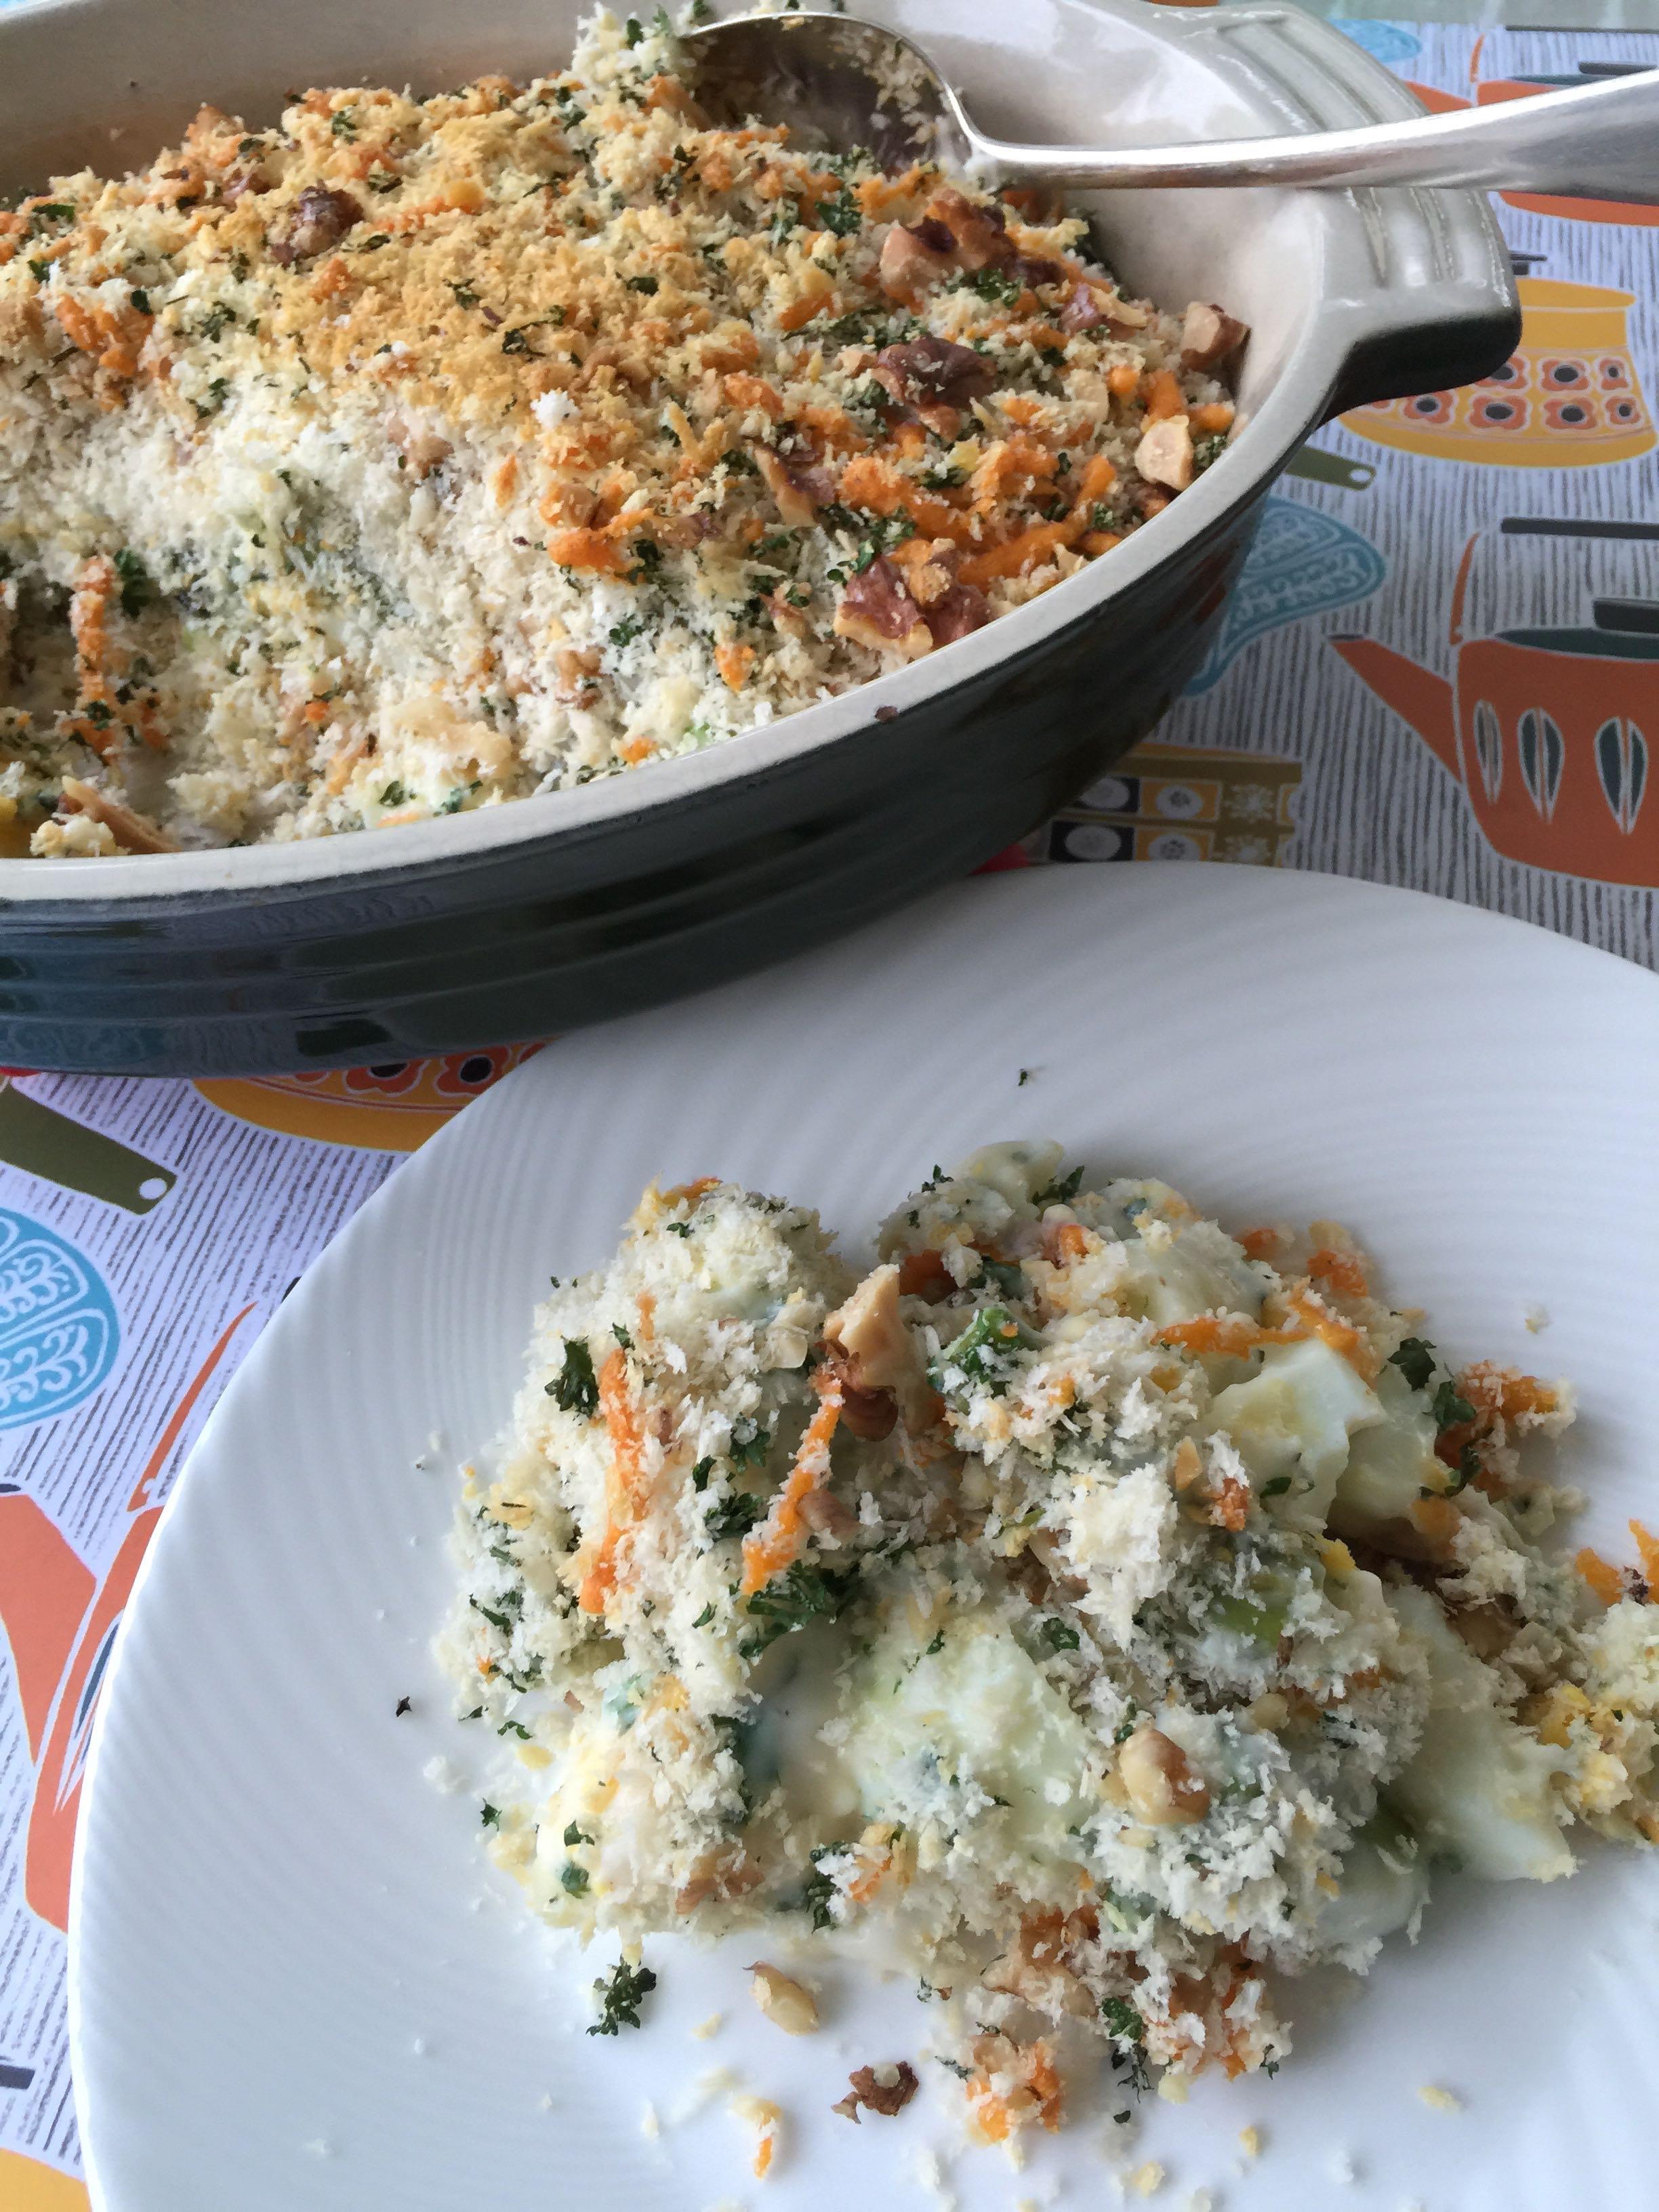 Asparagus and egg crumble